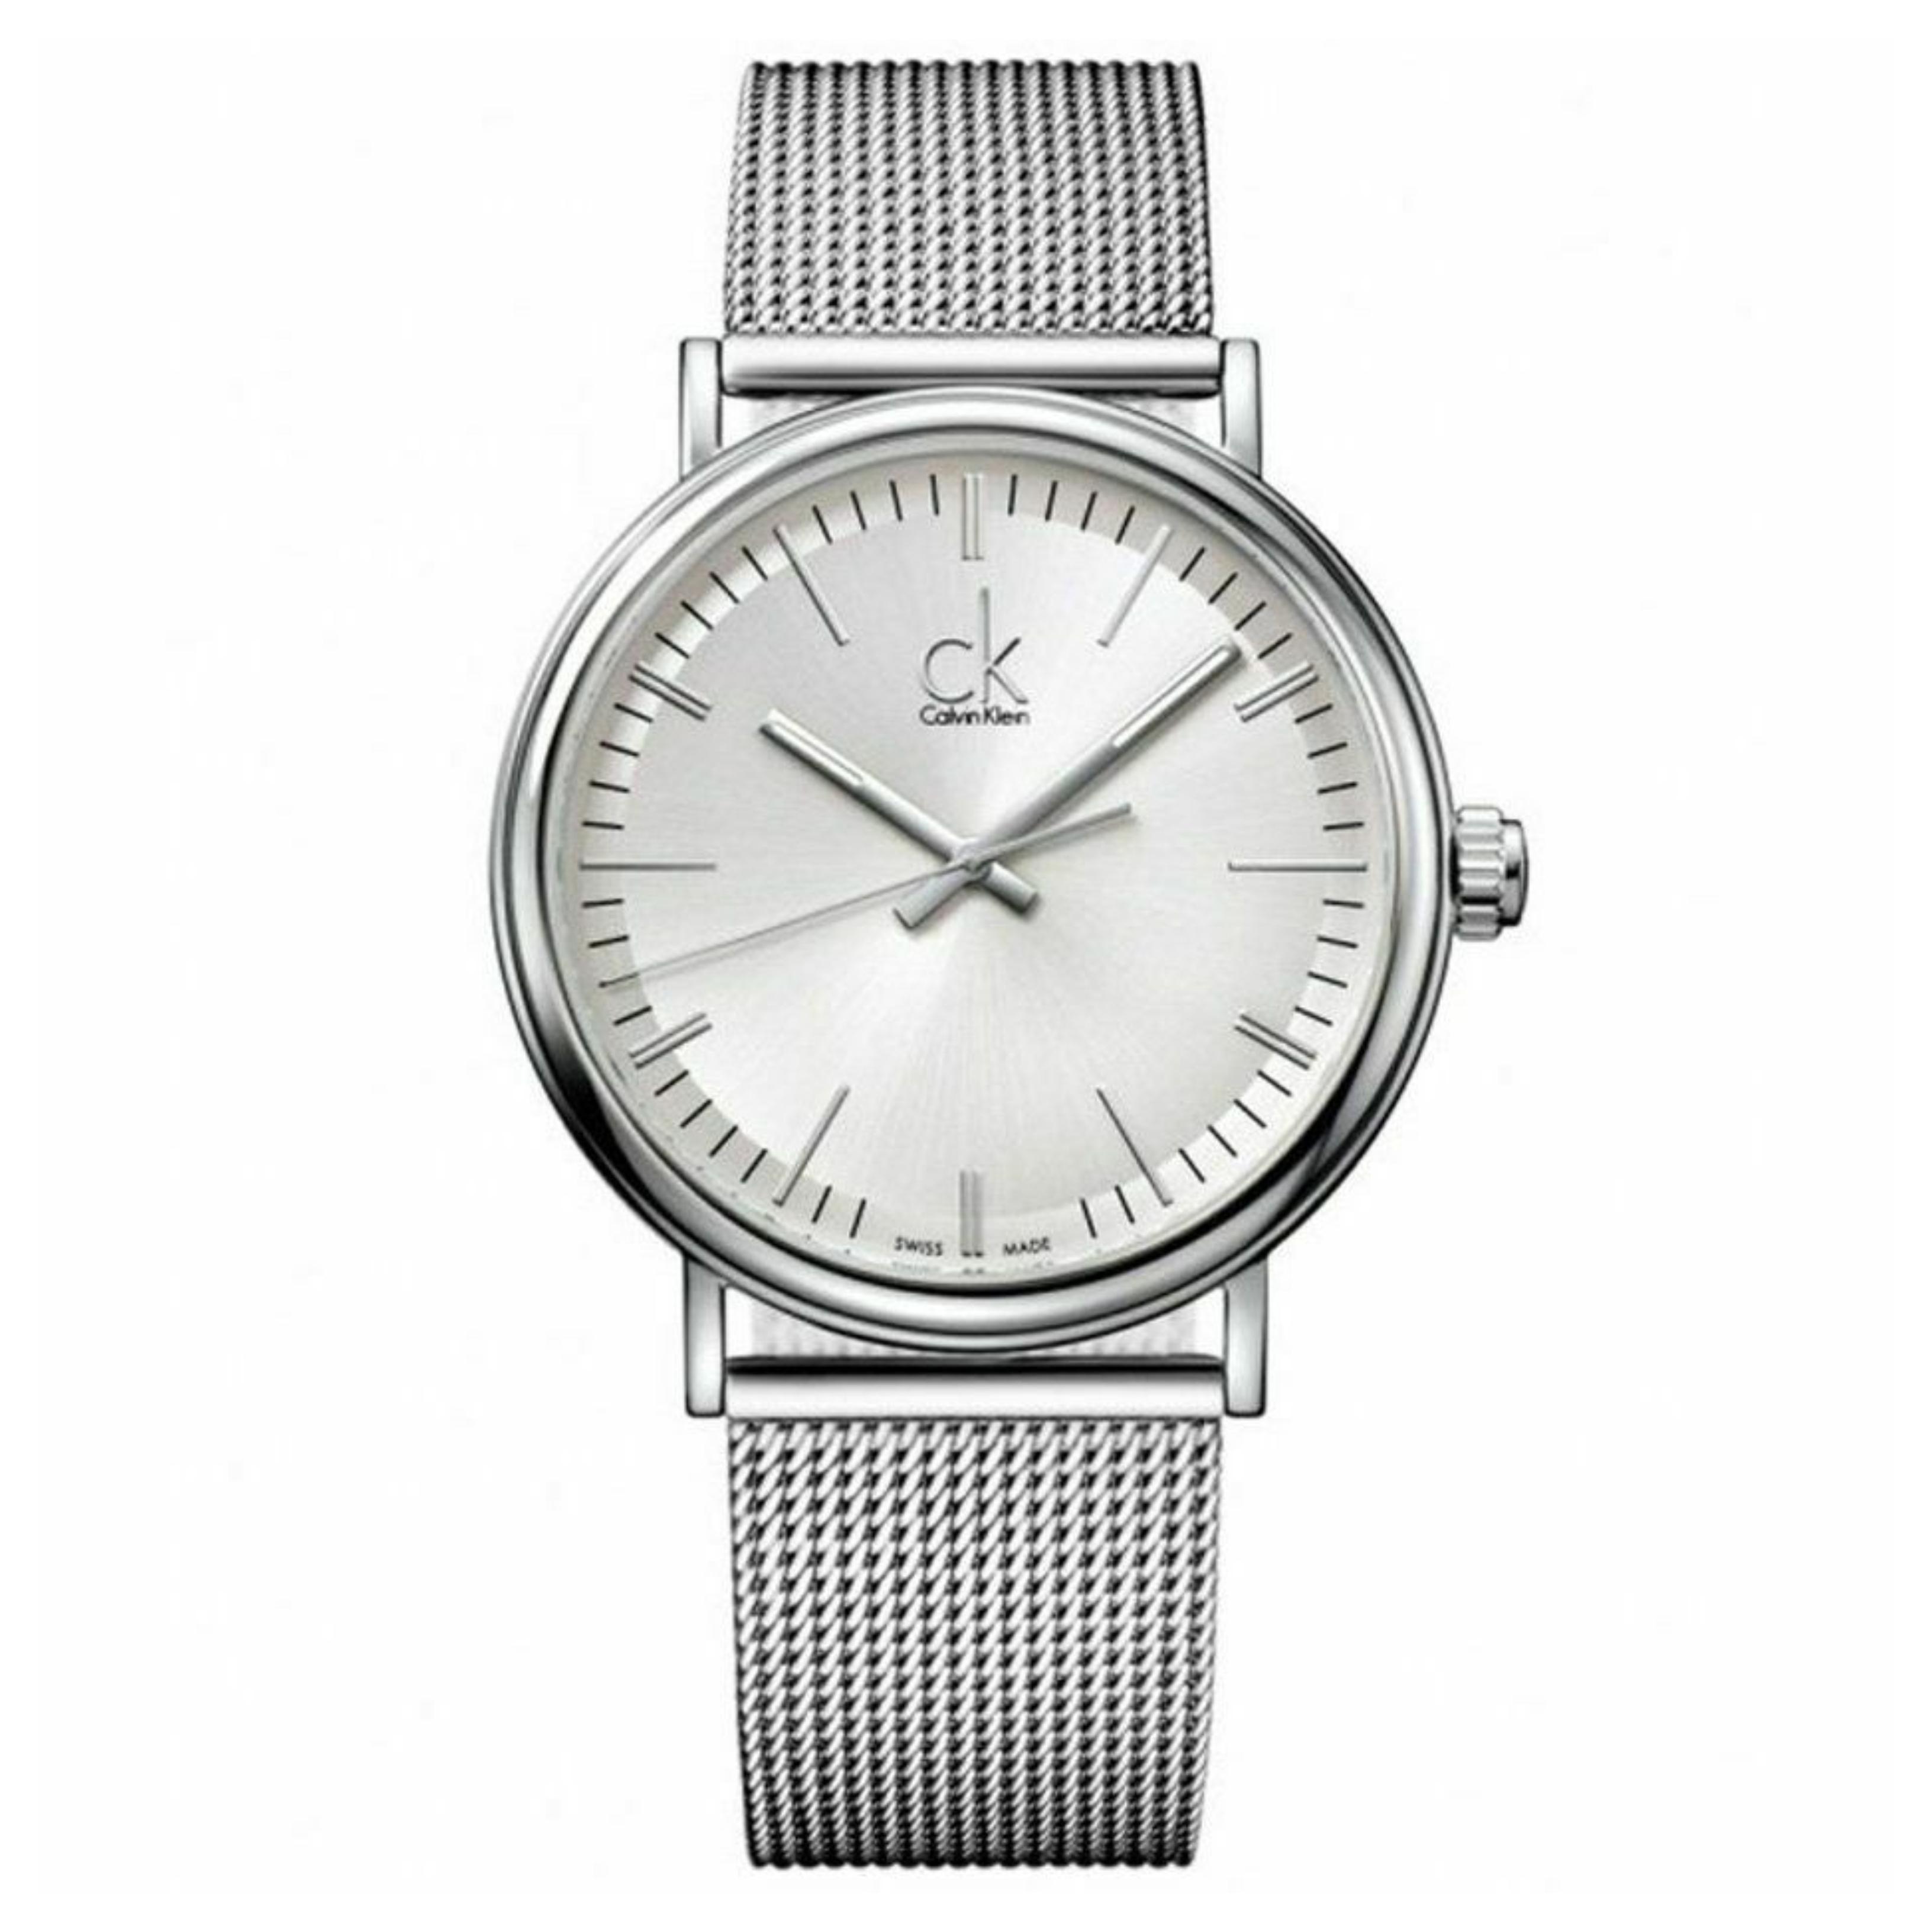 Calvin Klein Surround Men's Watch K3W21126 | Silver Dial | Stainless Mesh Strap